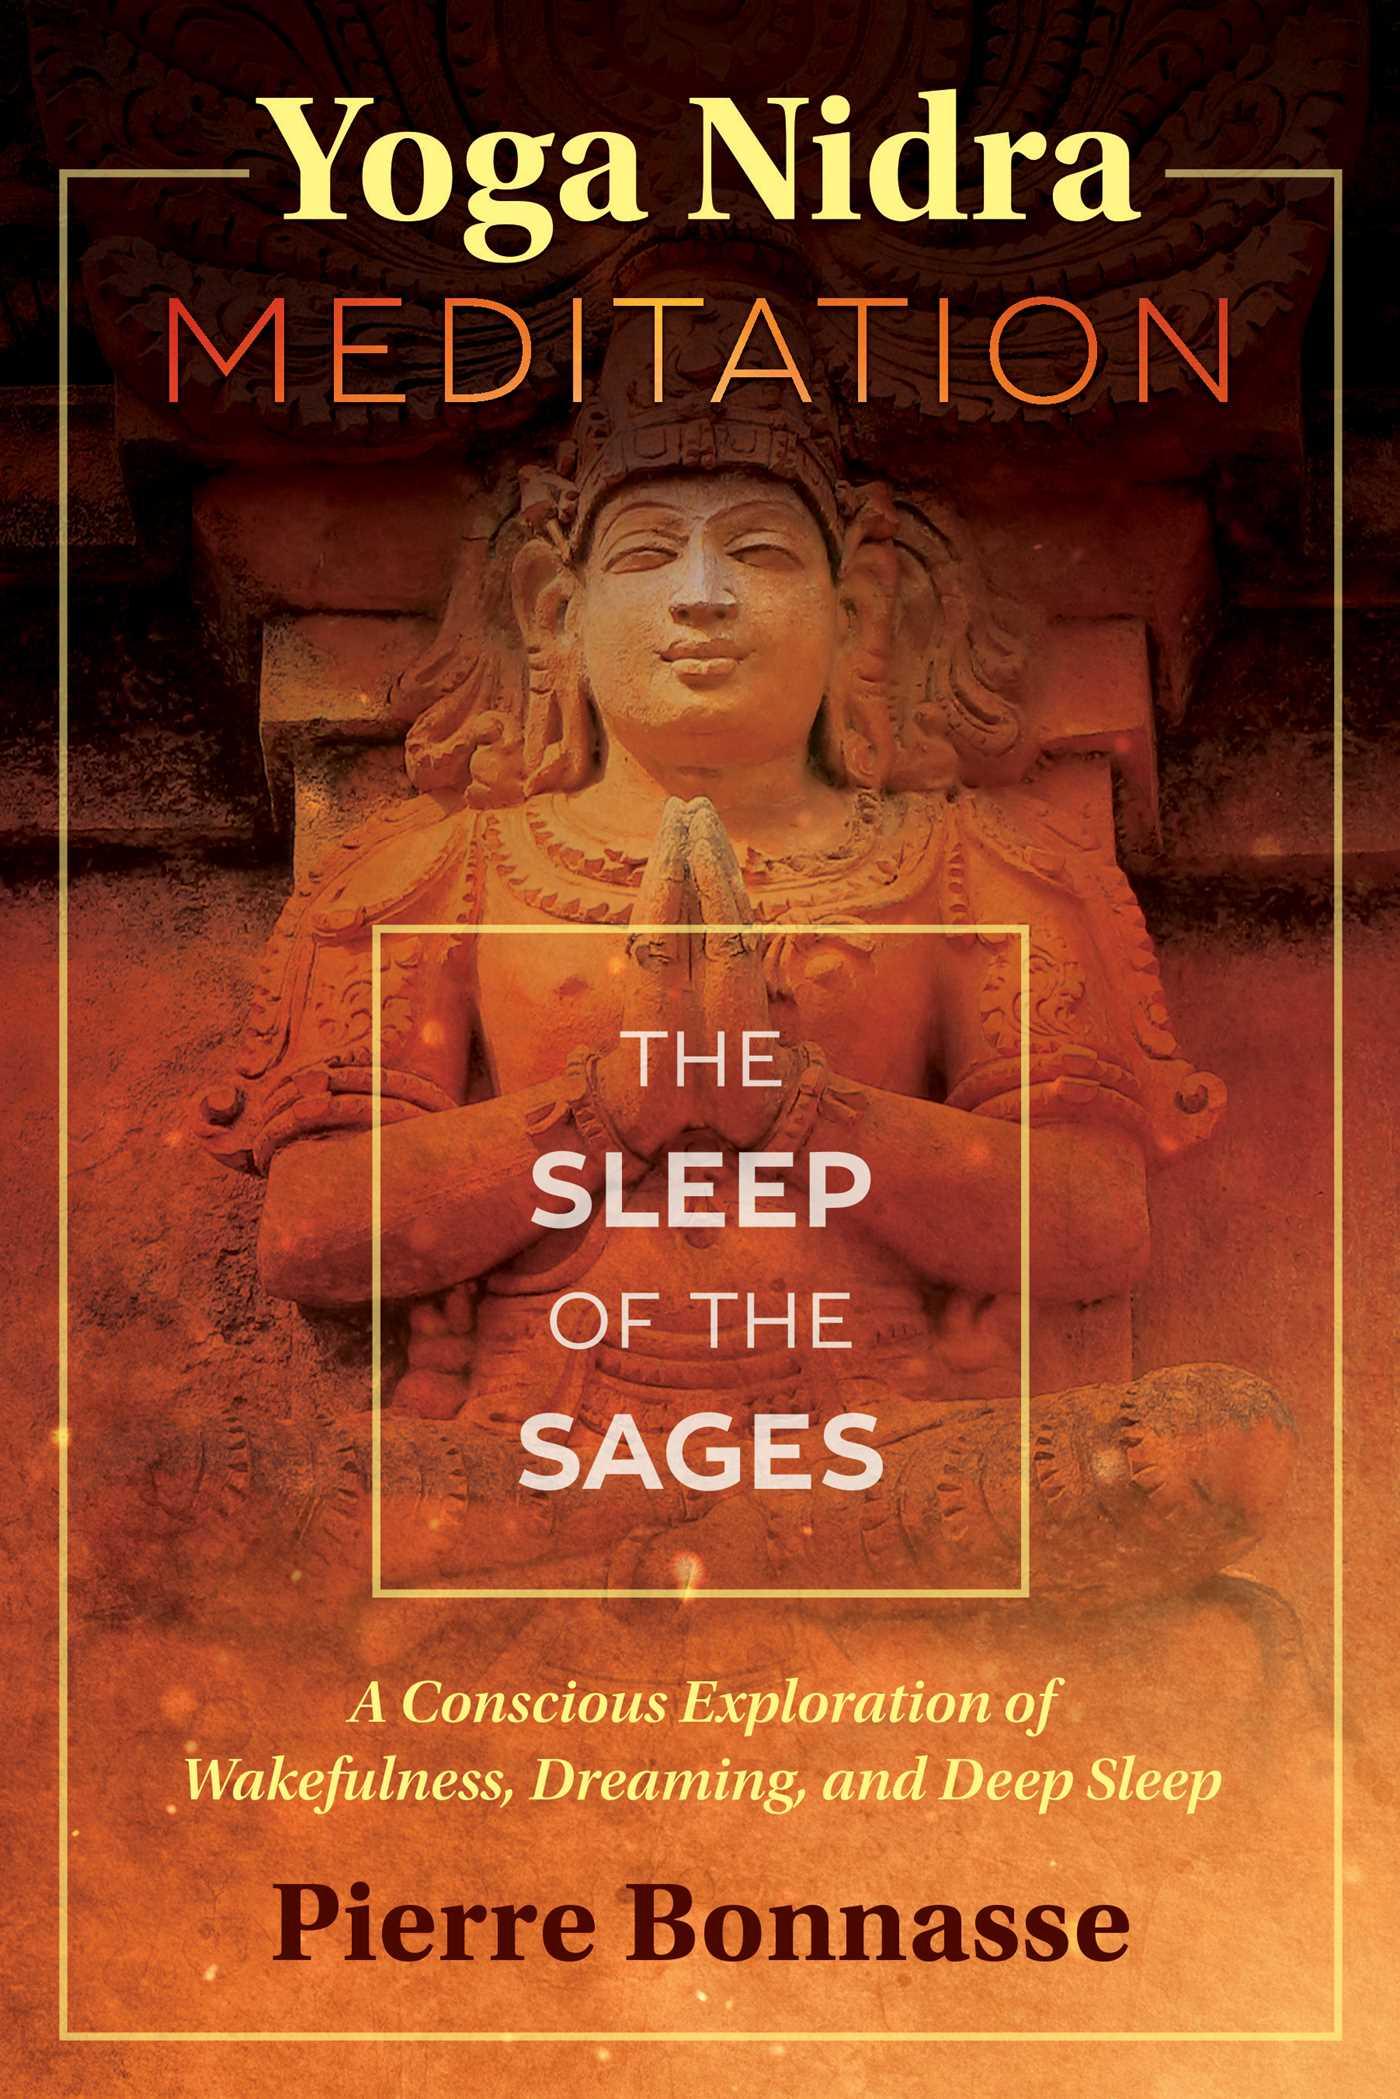 Yoga nidra meditation 9781620556771 hr